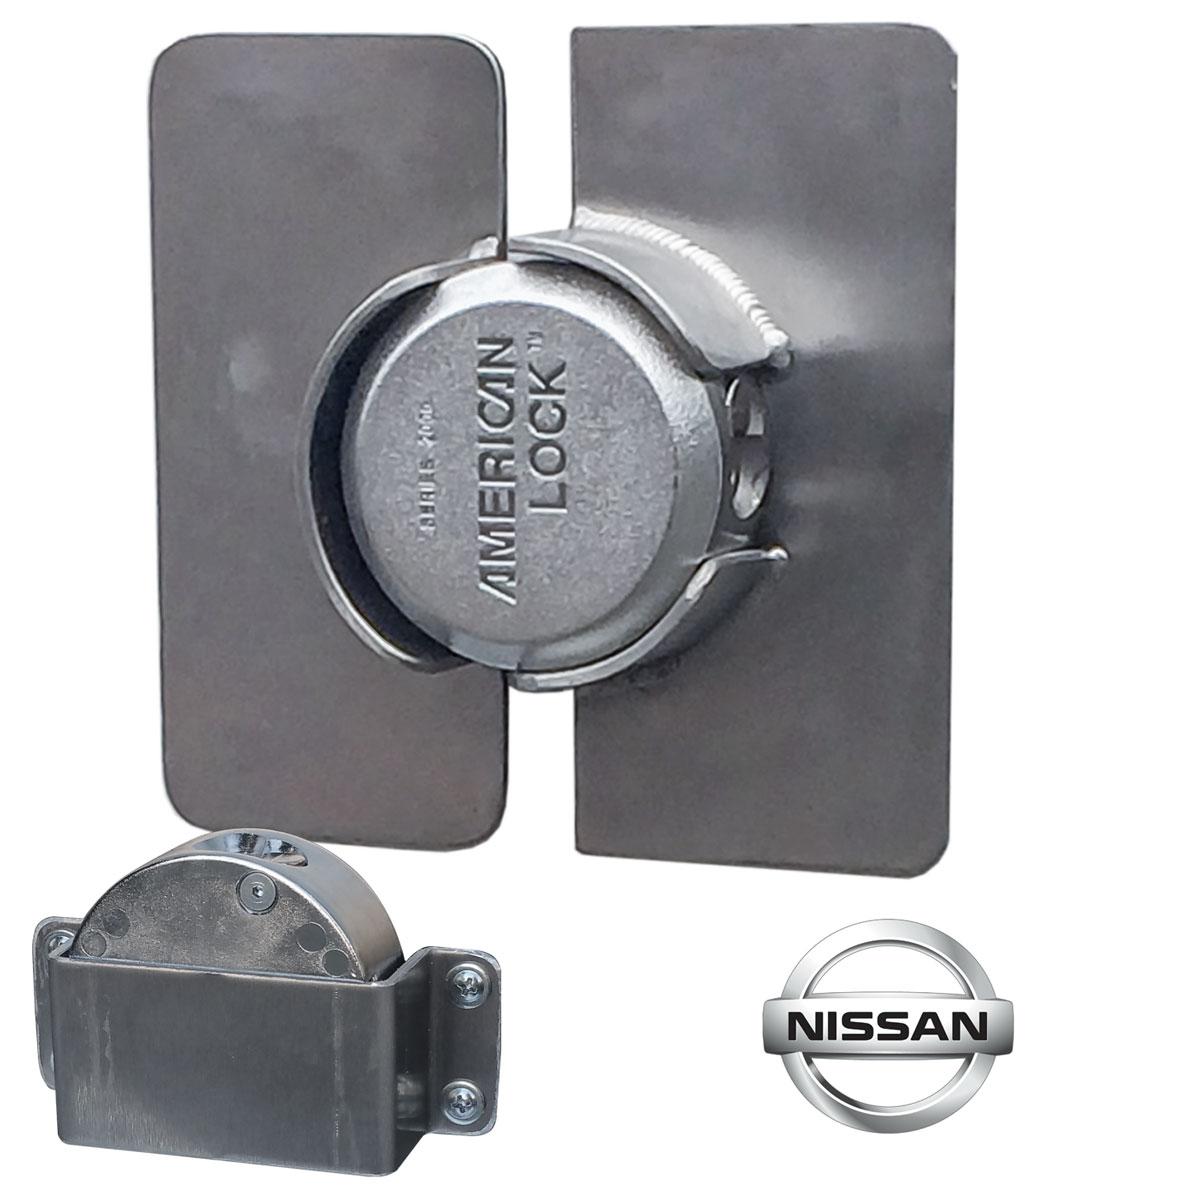 Nissan NVPuck Lock Kit Rear DoorSKU: 170003